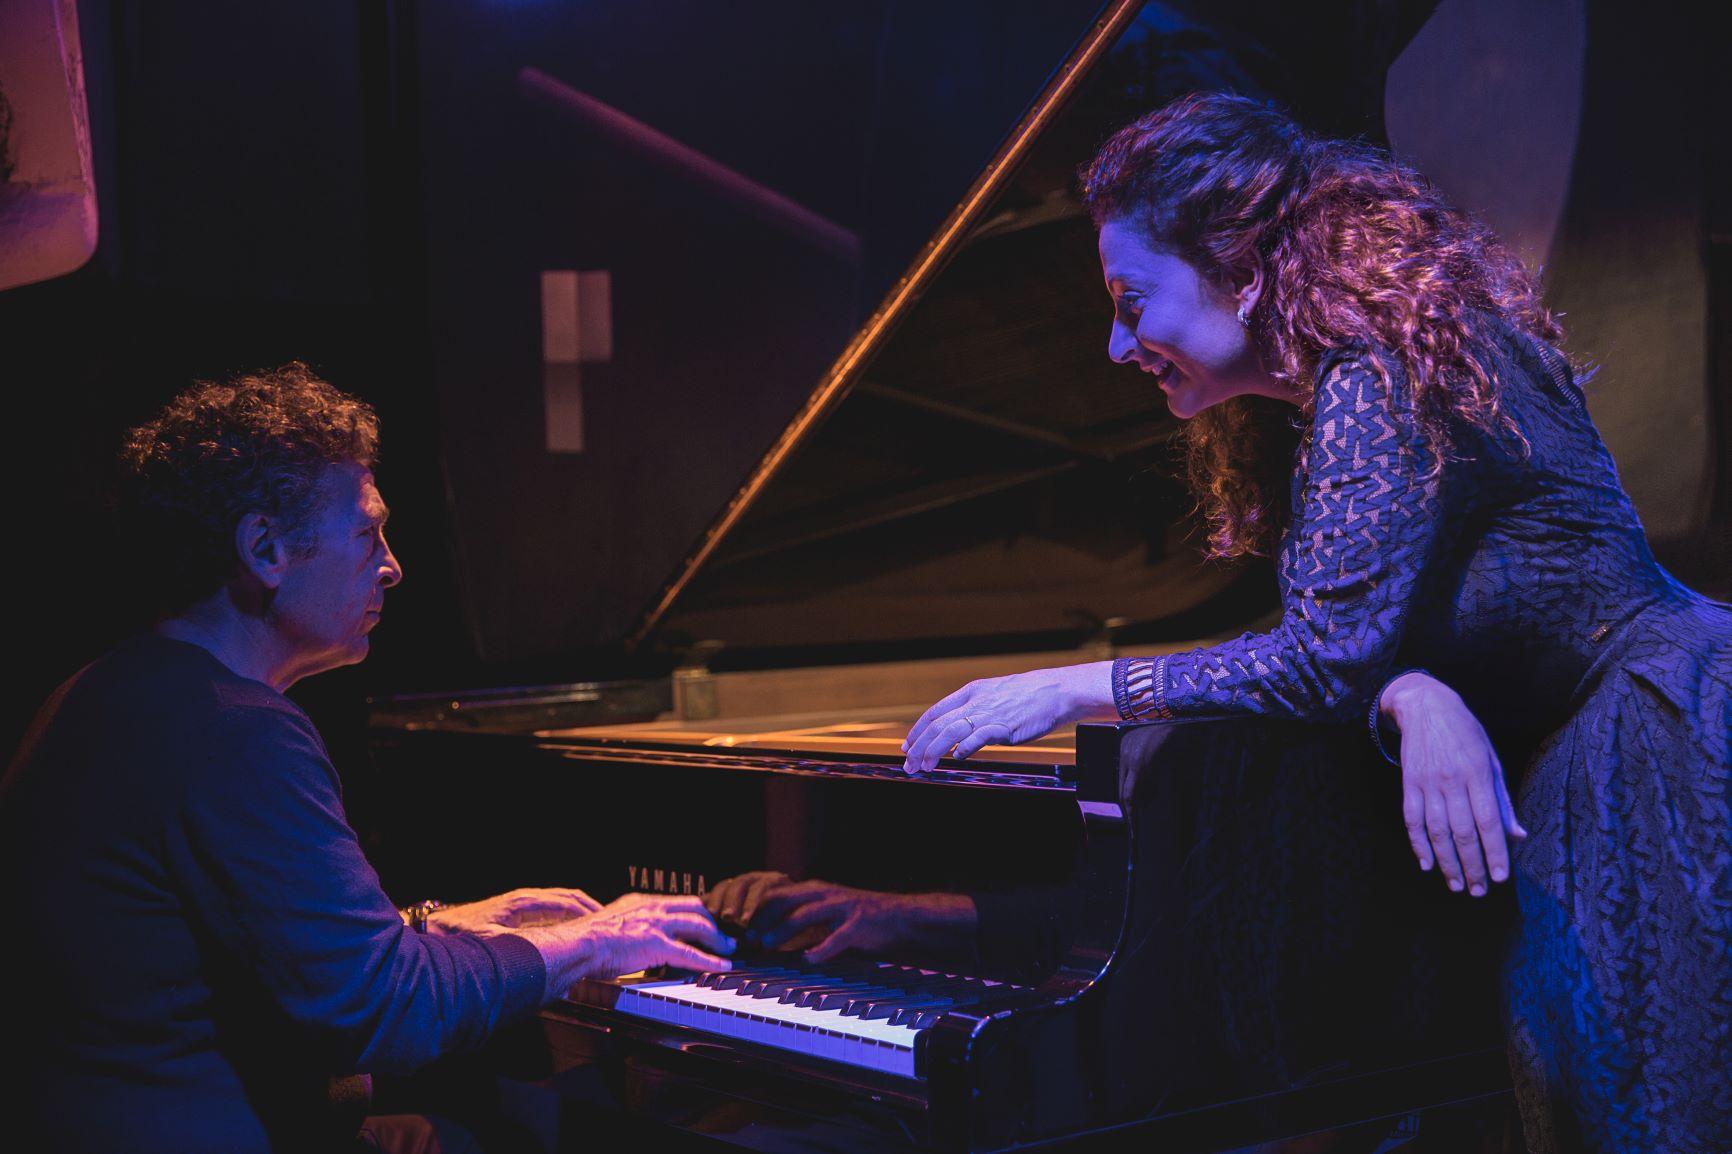 NEW RELEASE: Composer and Pianist Cettina Donato Presents New Album I SICILIANI Alongside Actor Ninni Bruschetta, Out May 14, 2021